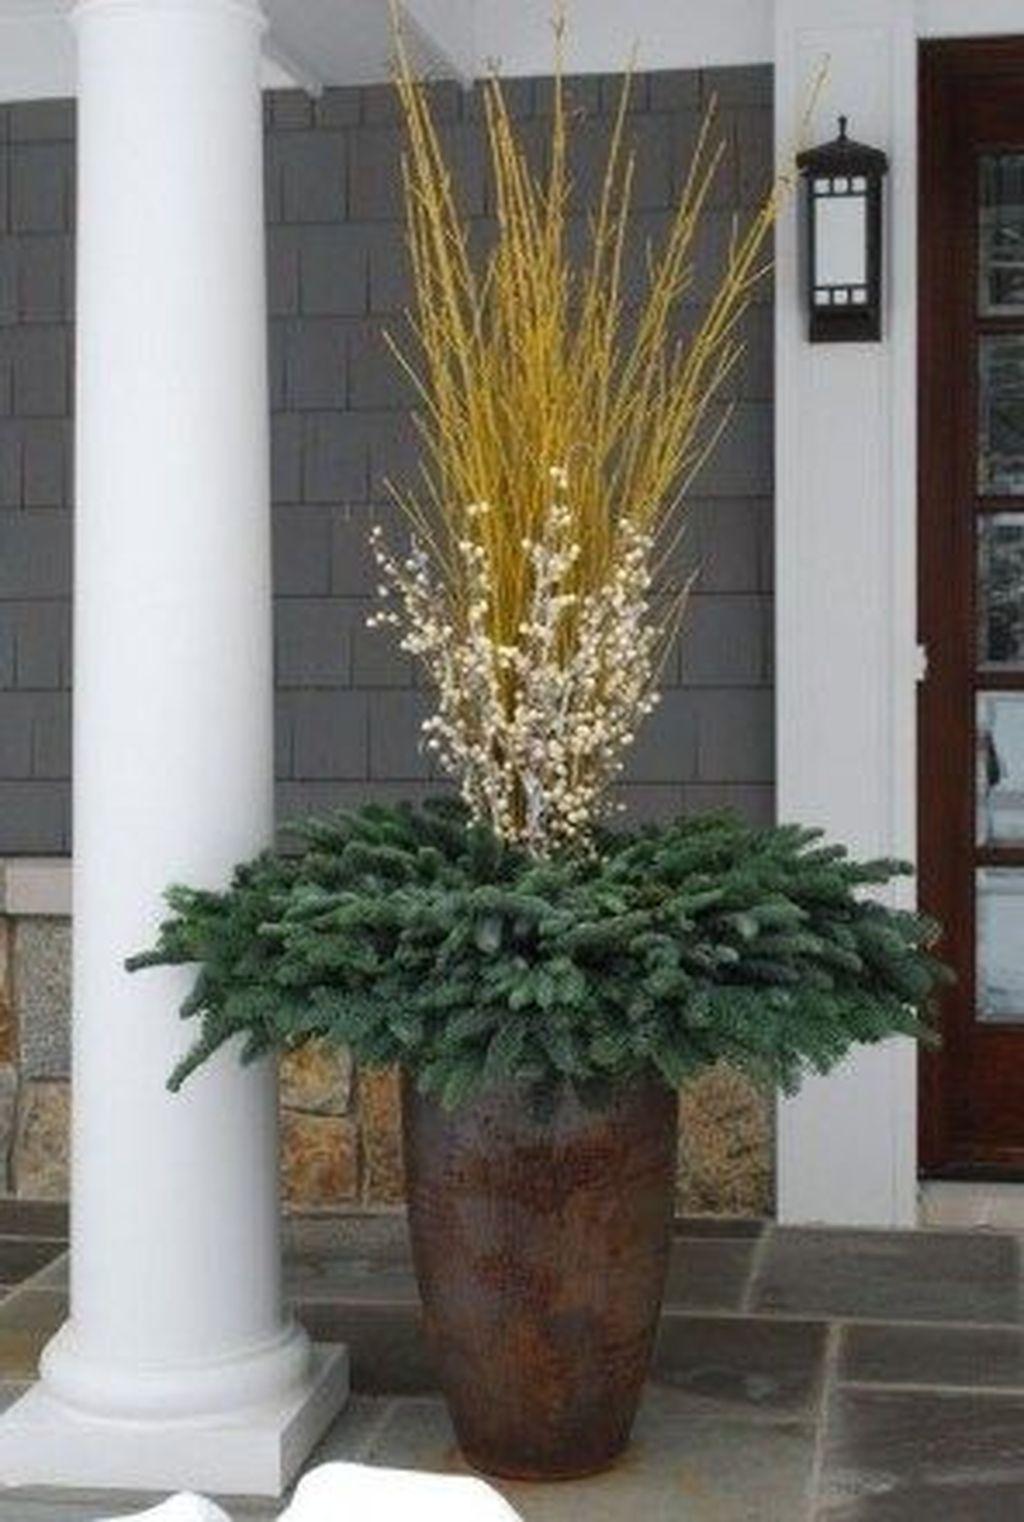 Inspiring Winter Container Gardening Ideas 10